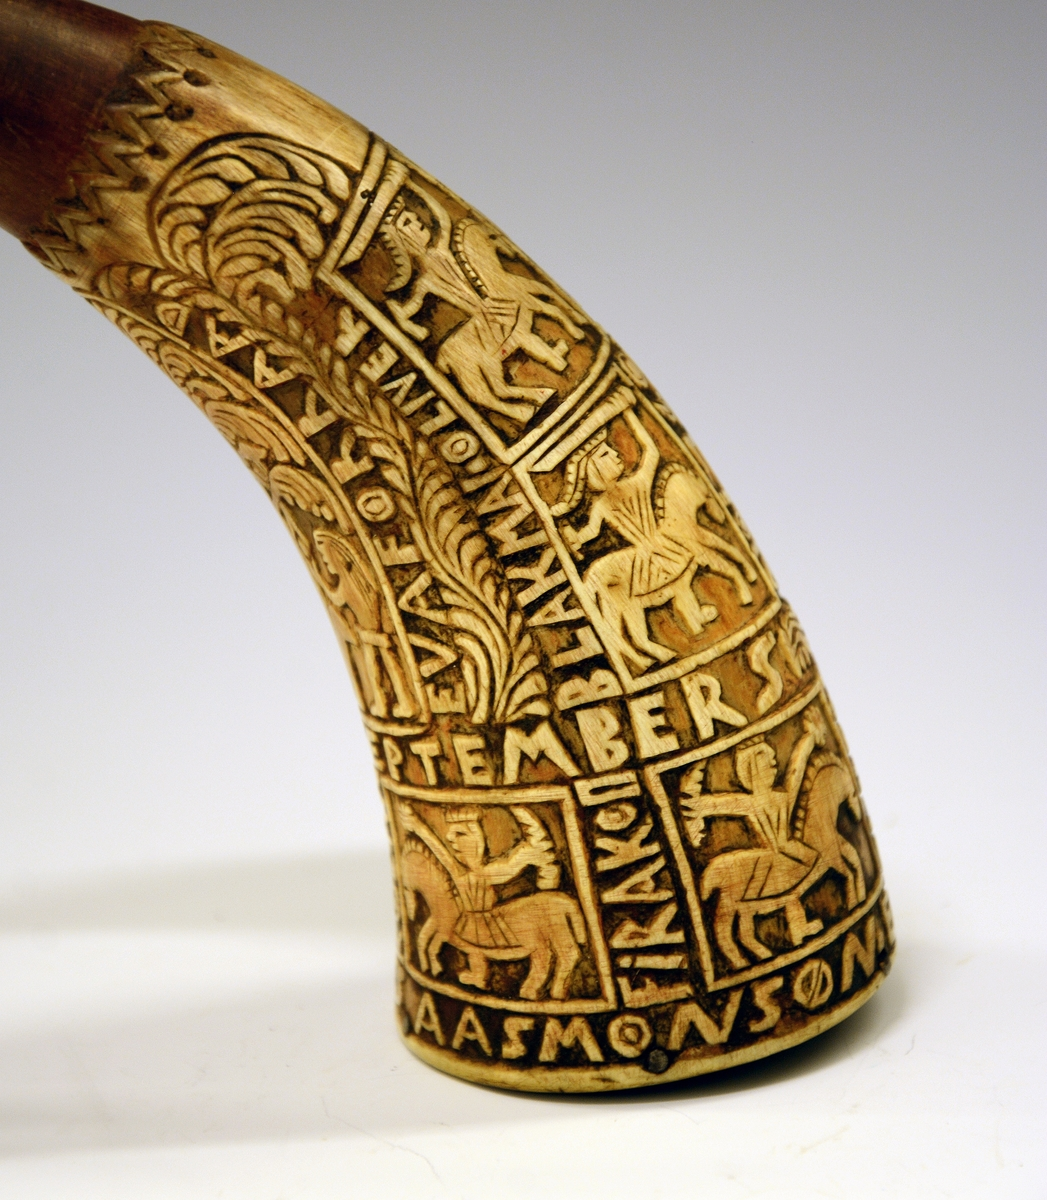 Figurer fra bibelhistorien og ryttere fra kvad, blant annet Rolandskvadet.